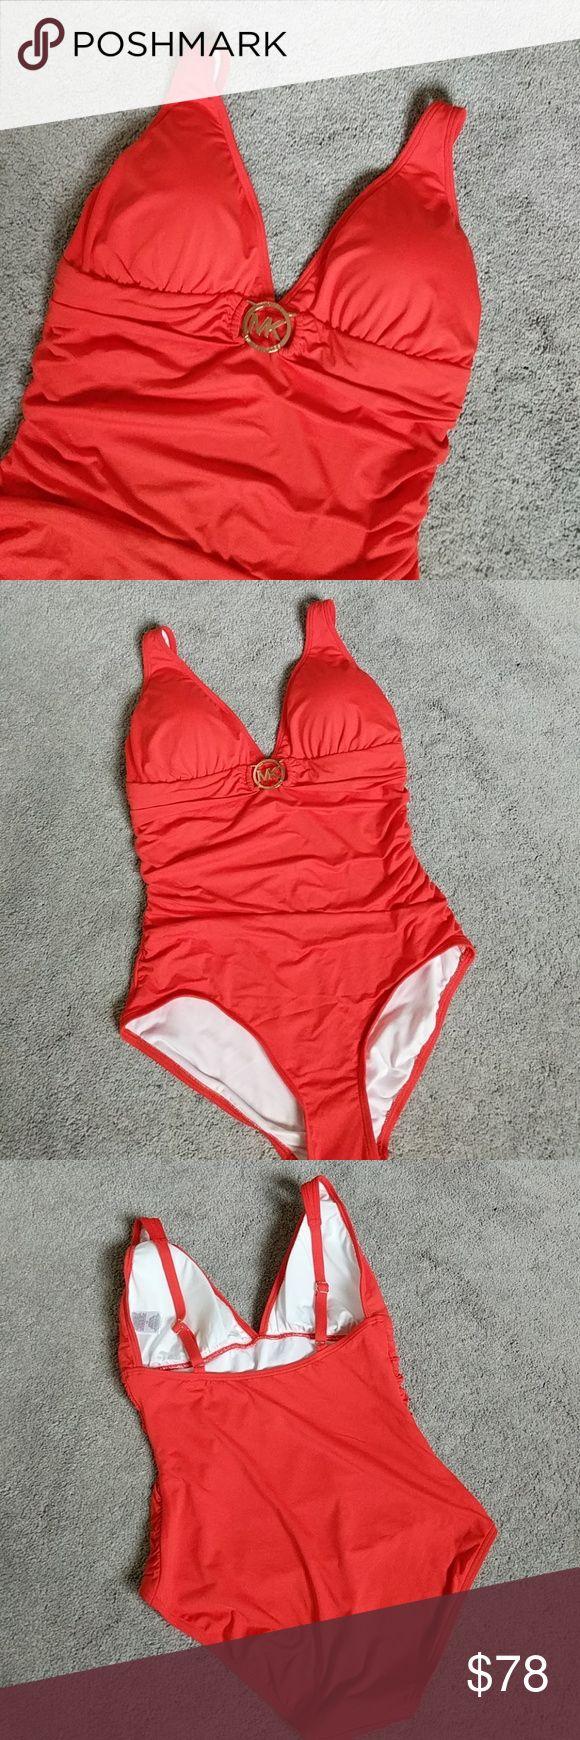 "🎀Michael Kors Orange One Piece Swimsuit 17"" flat across hips14.25"" across bust  Padded bust  Adjustable straps to fit Michael Kors Swim One Pieces"